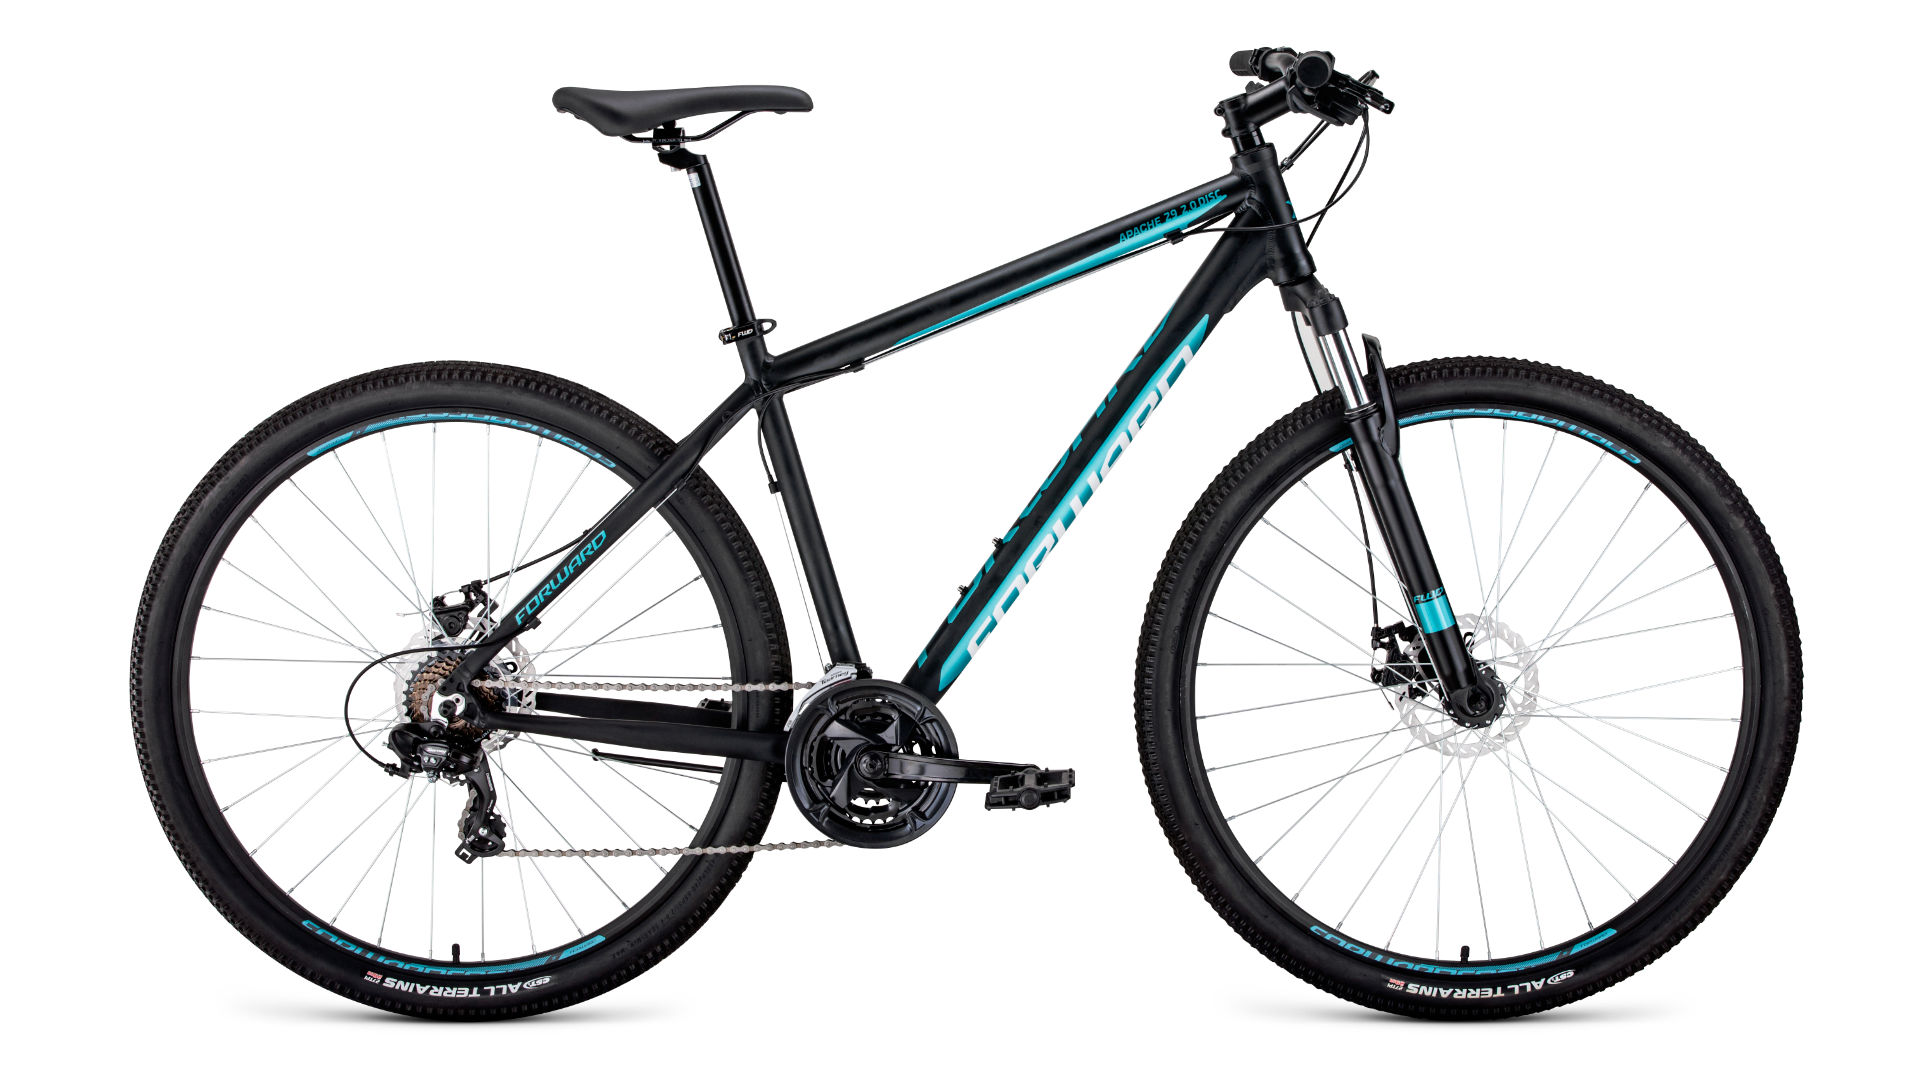 FORWARD Велосипед FORWARD APACHE 29 2.0 disc (2020) черный 19